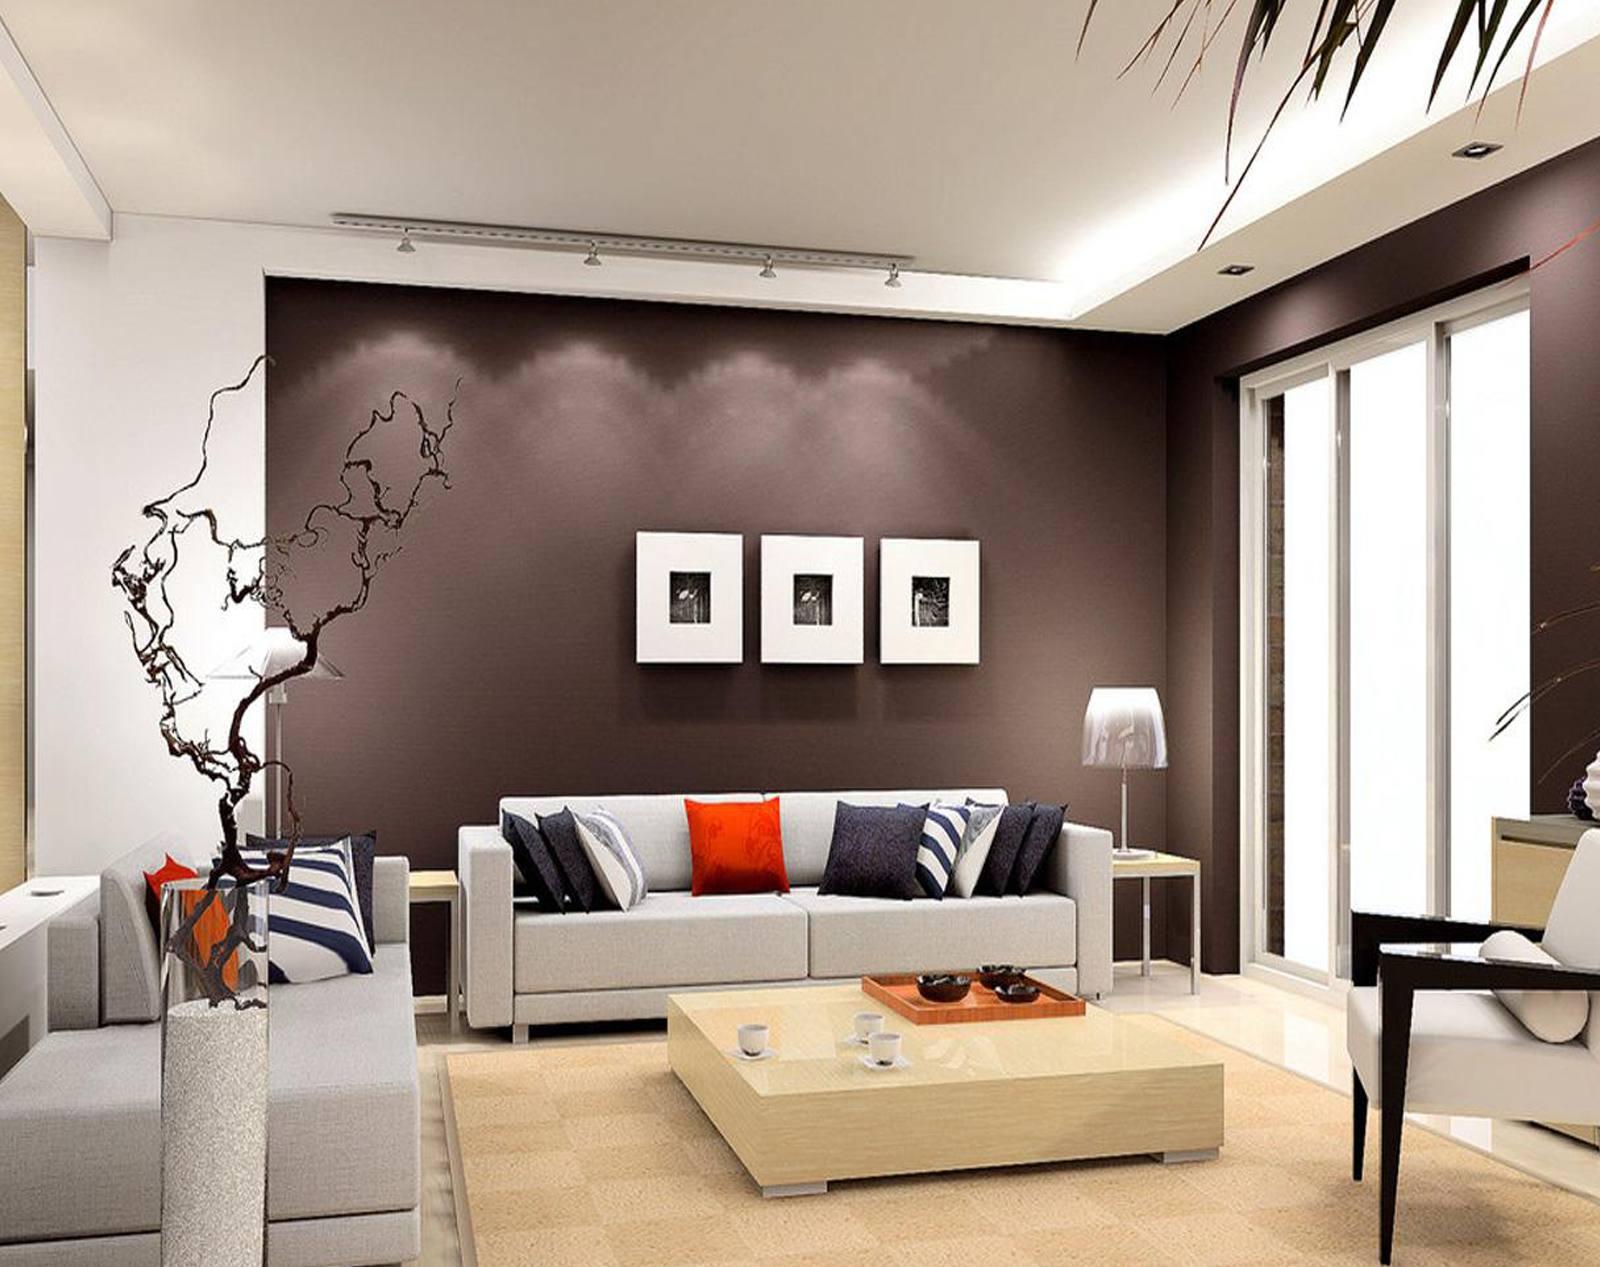 Best interior decoration company in chennai with good for Interior decoration in chennai